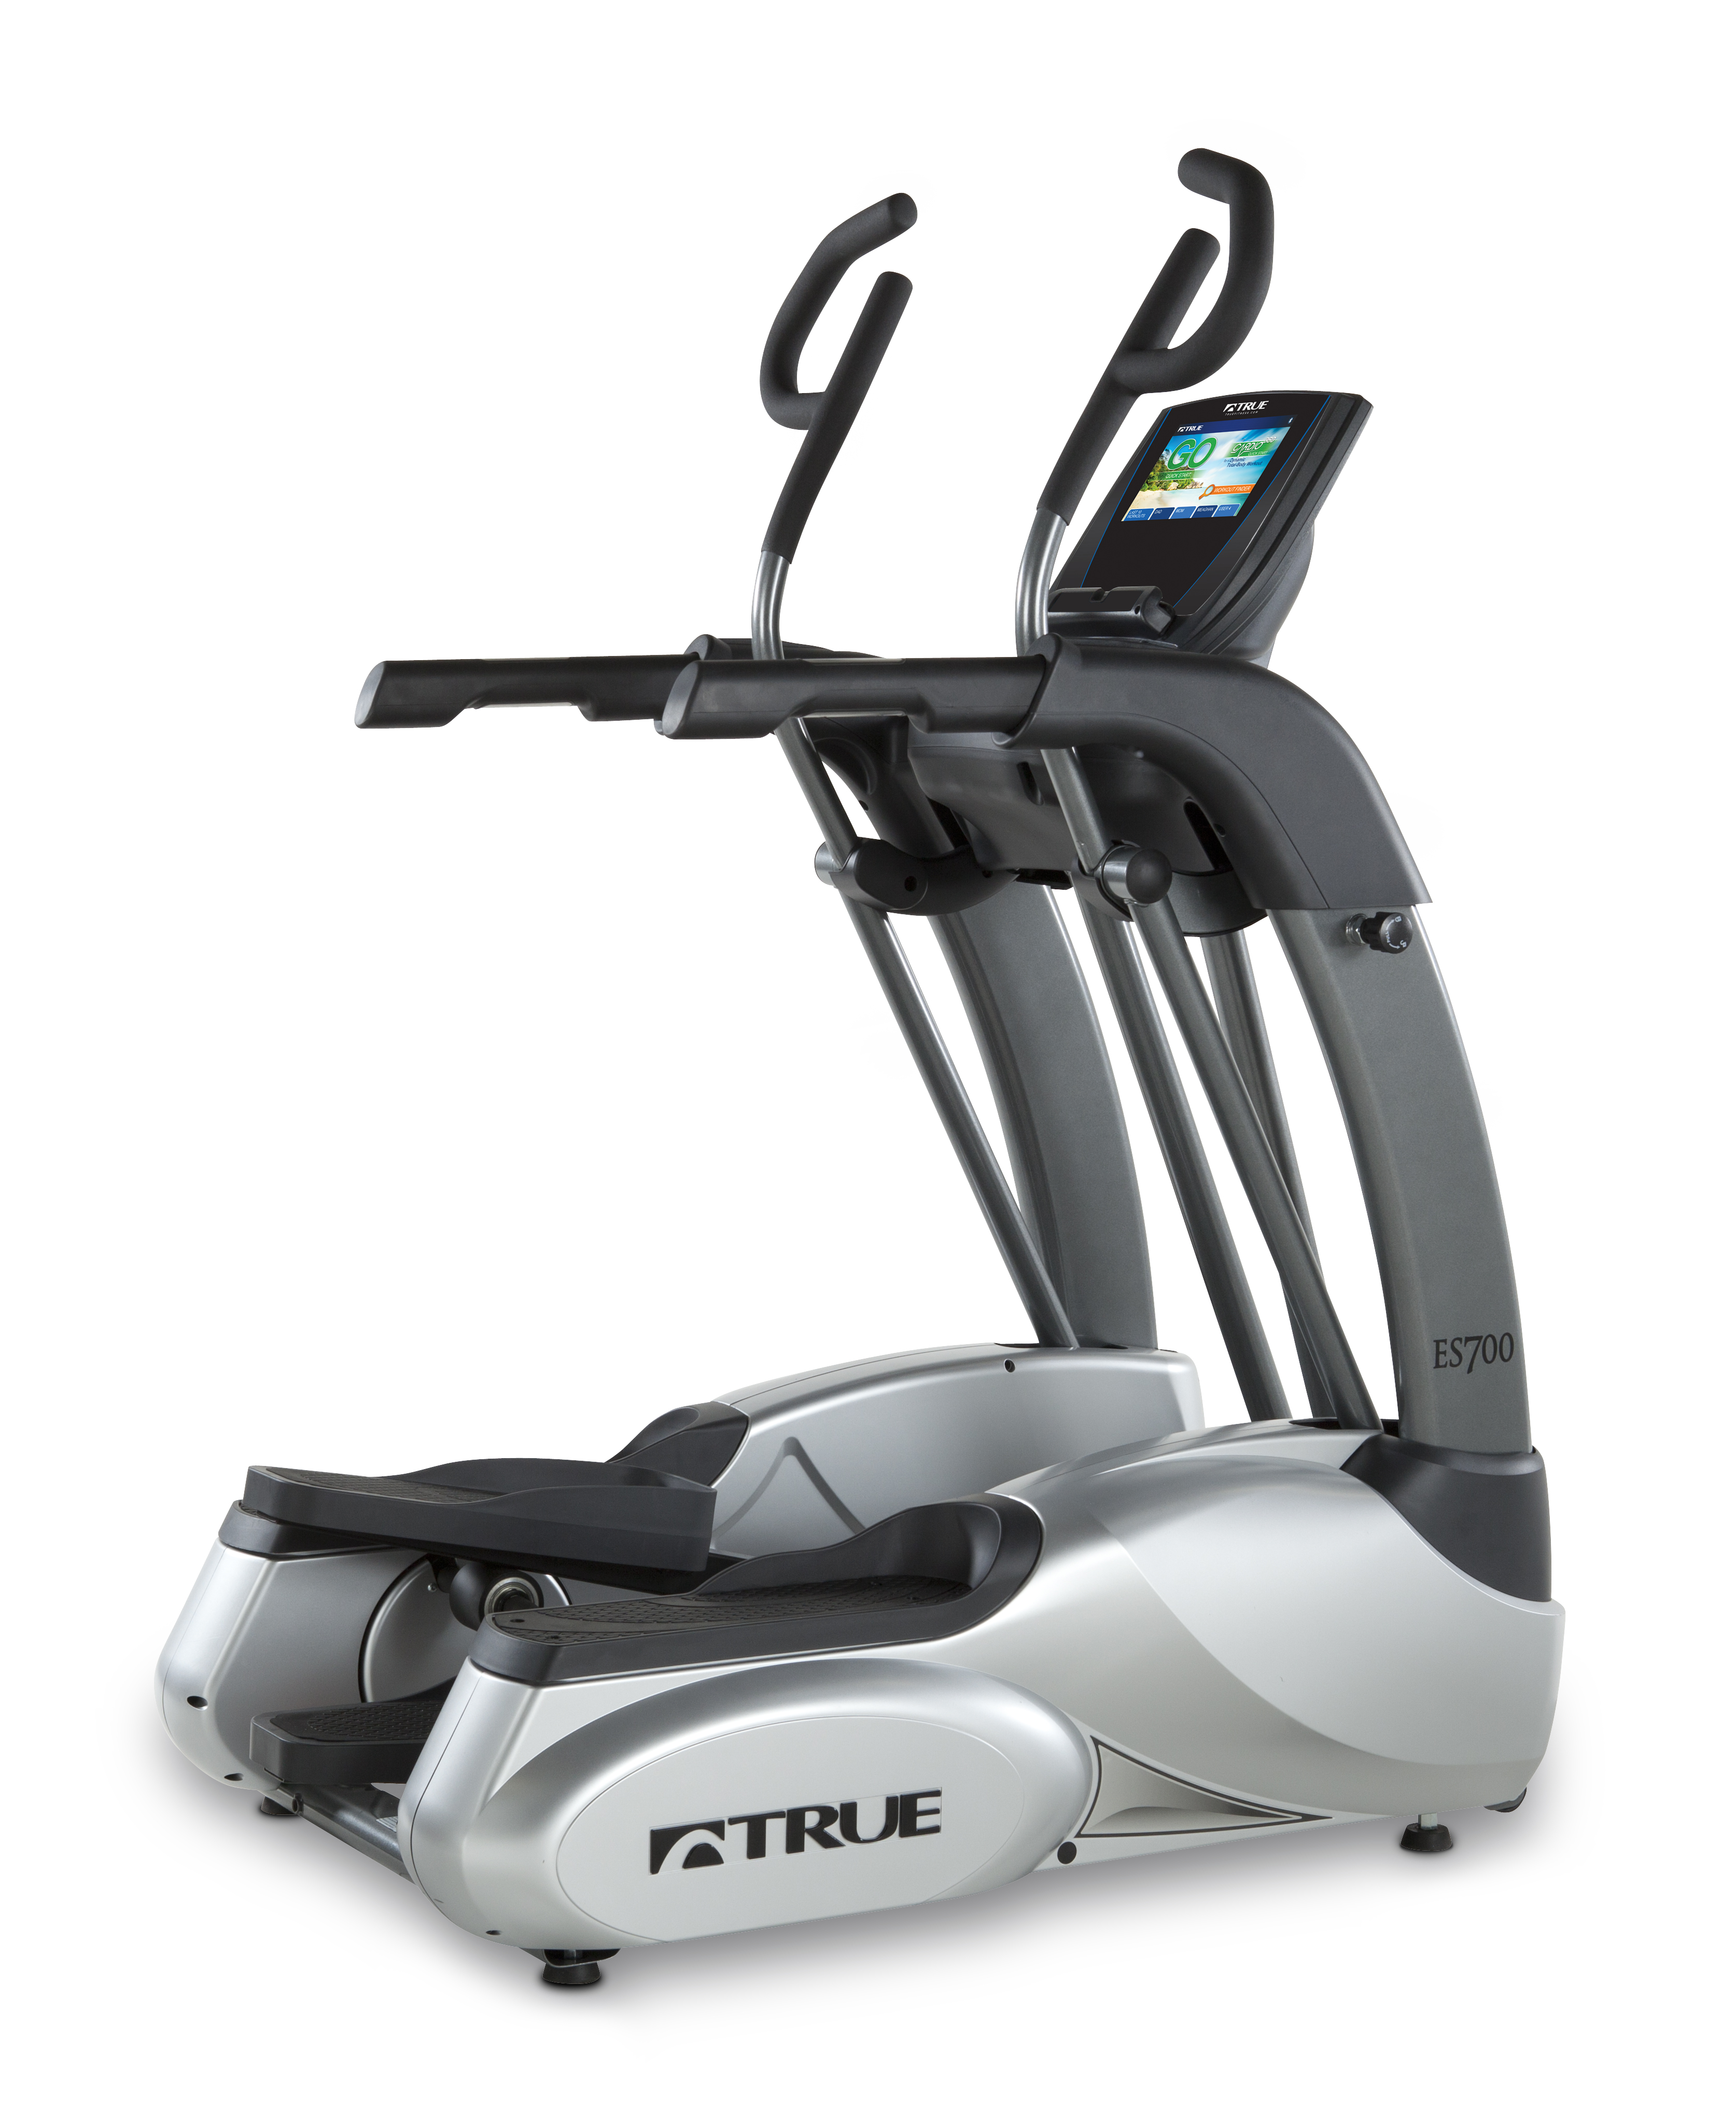 Fitness Equipment Services: Residential TRUE ES700 Elliptical